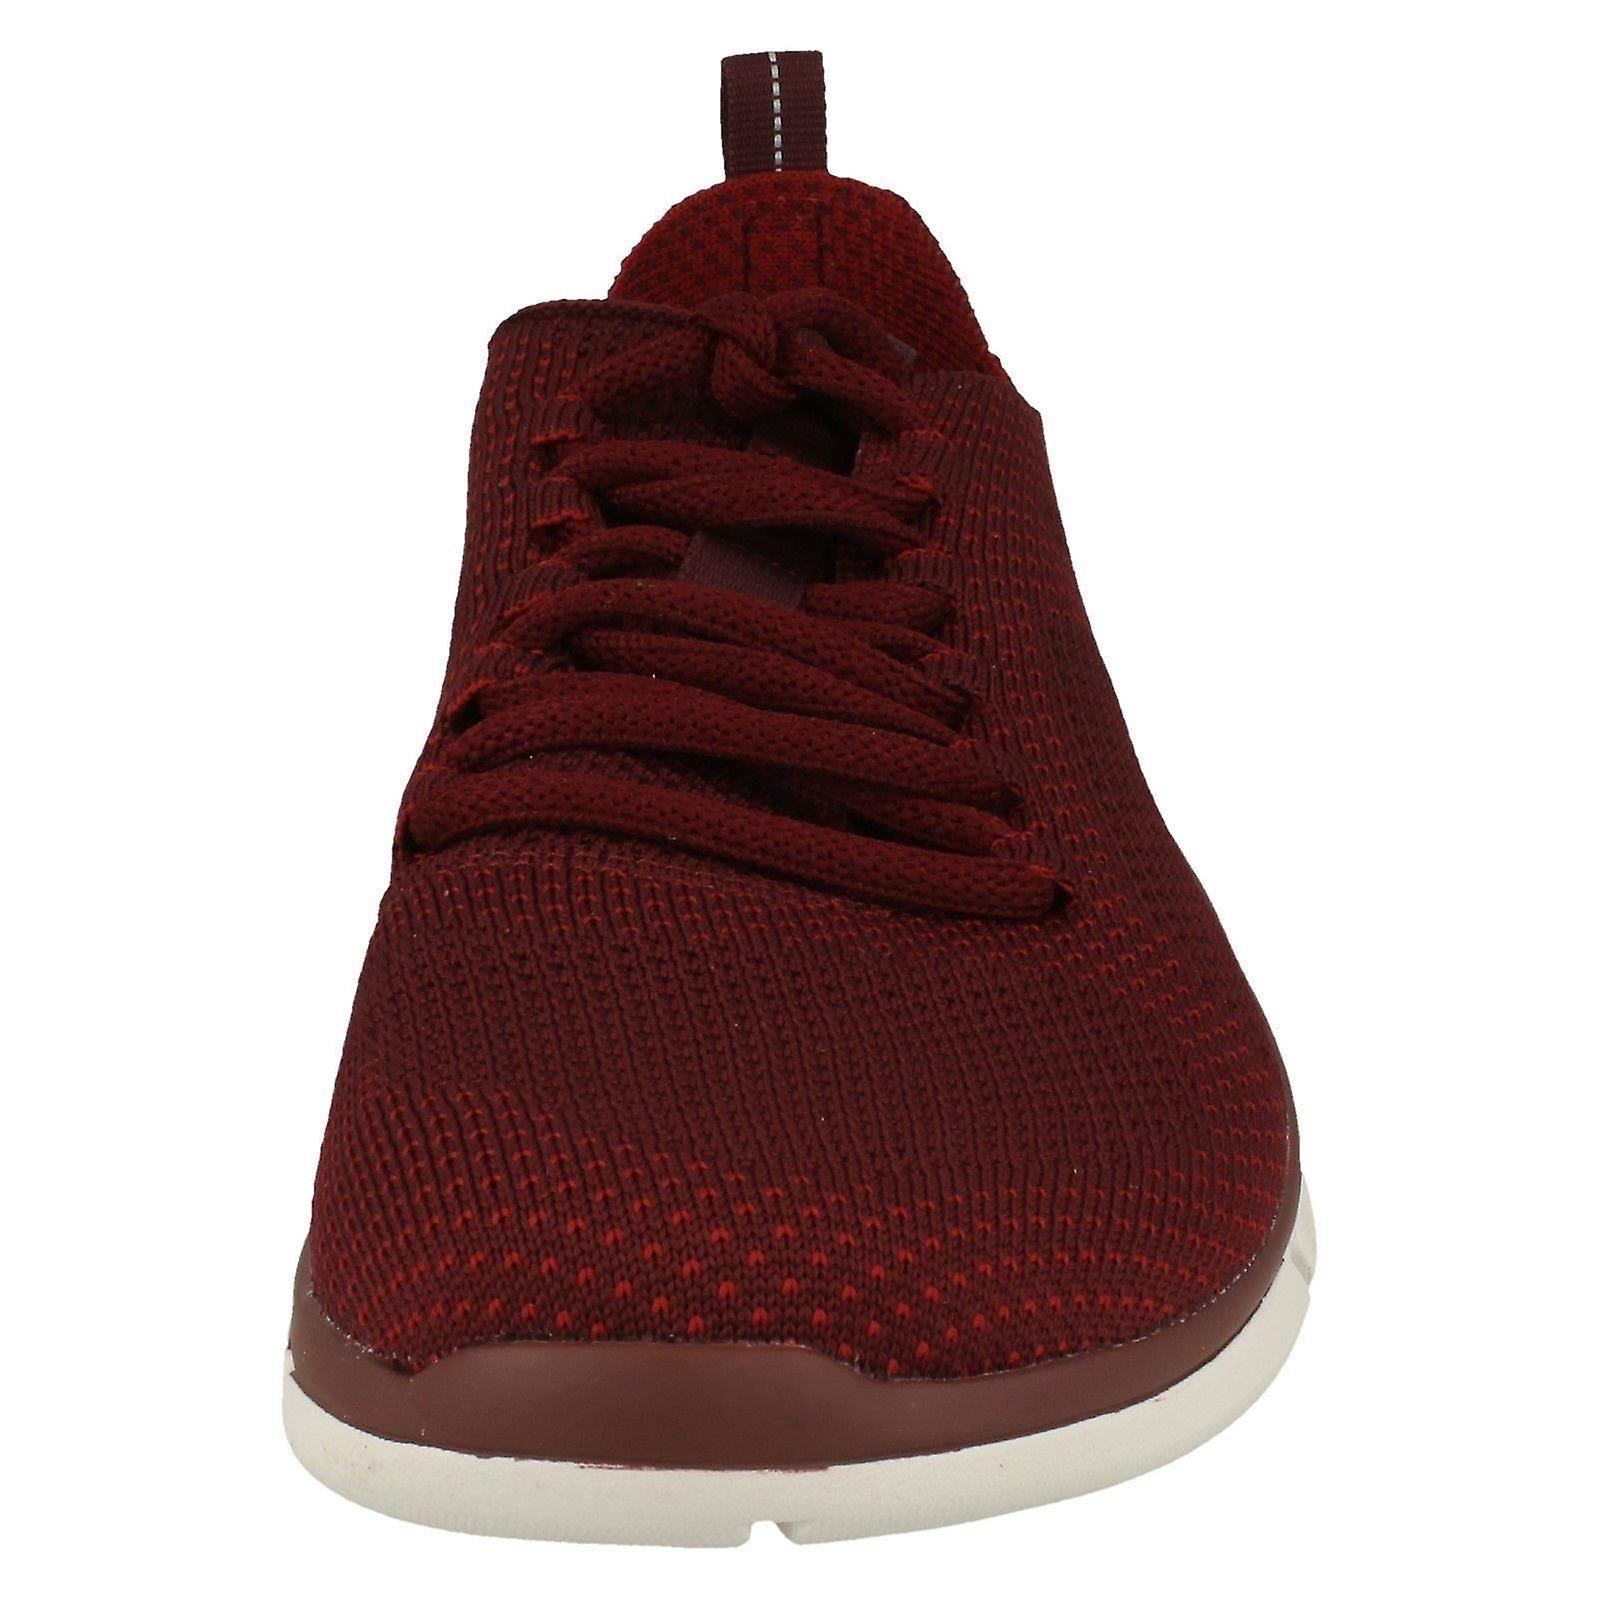 10M UK EU Size Mens US Triken Size 43 Red Lace Clarks Up Run Brick 9G Size Trainers Textile THFzUqTAwn